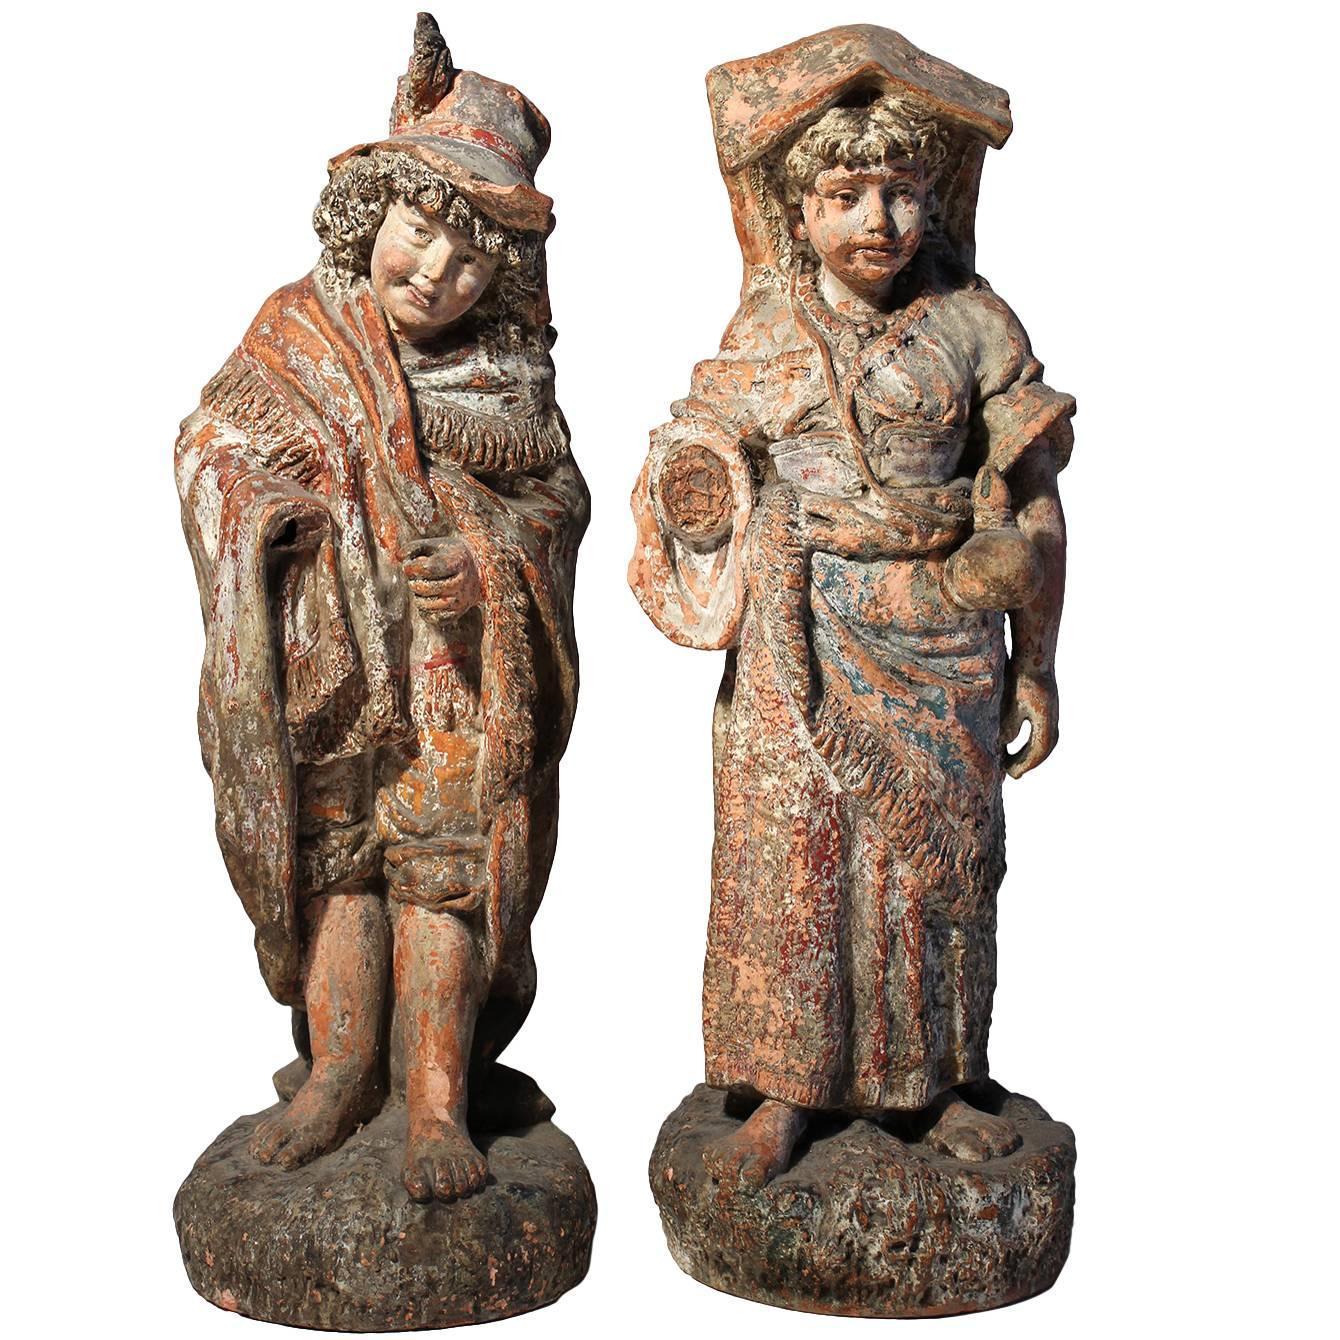 Antique Terracotta French Renaissance Garden Sculpture Statues